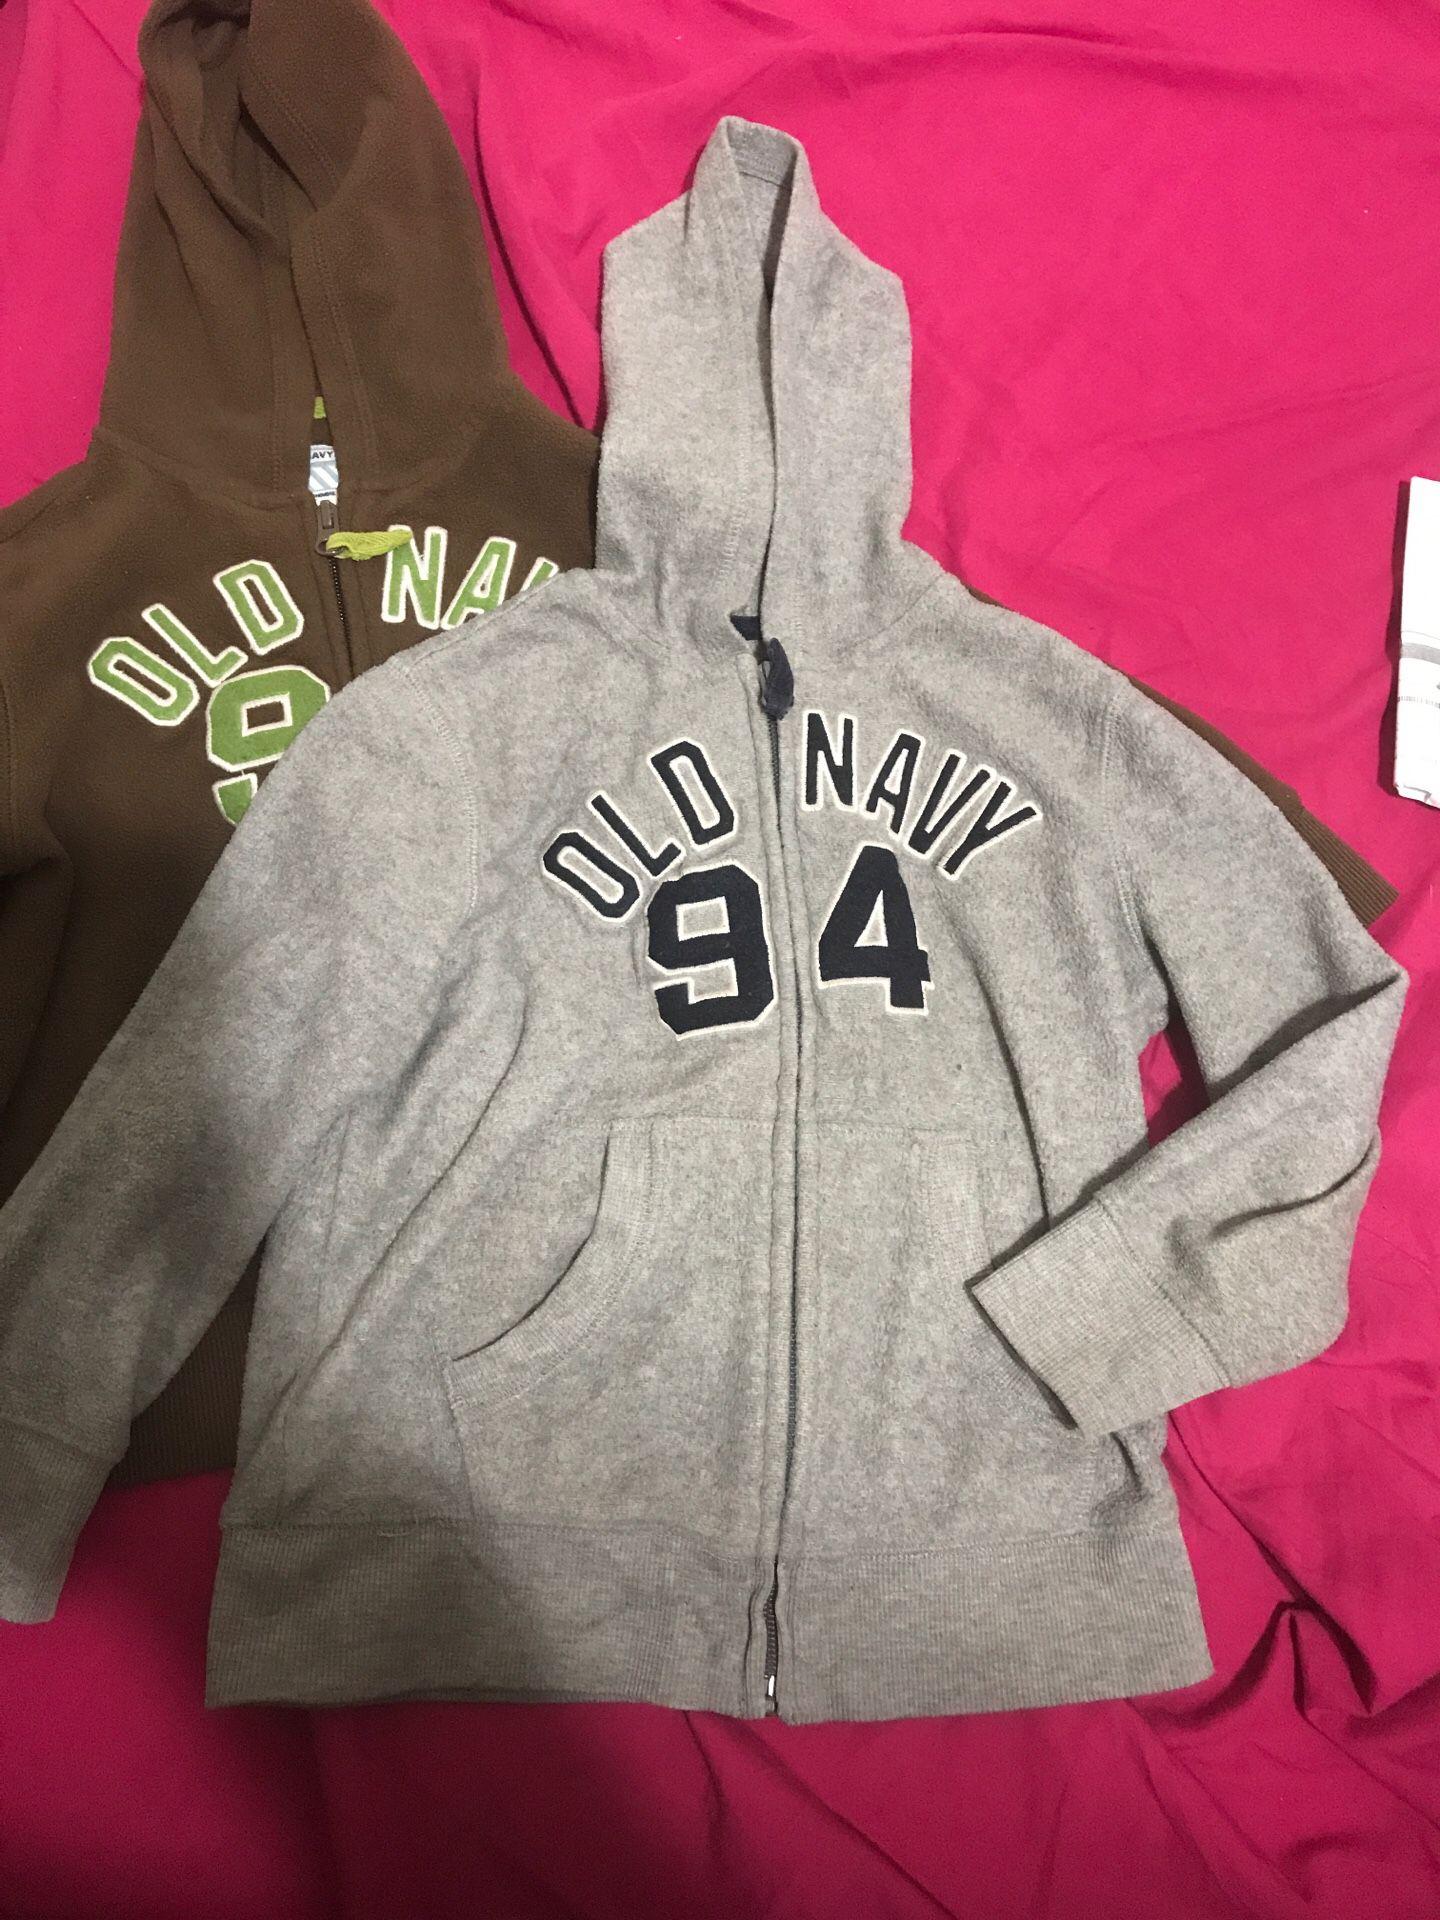 Boys size 5 fleece hoodie sweaters- set of 2